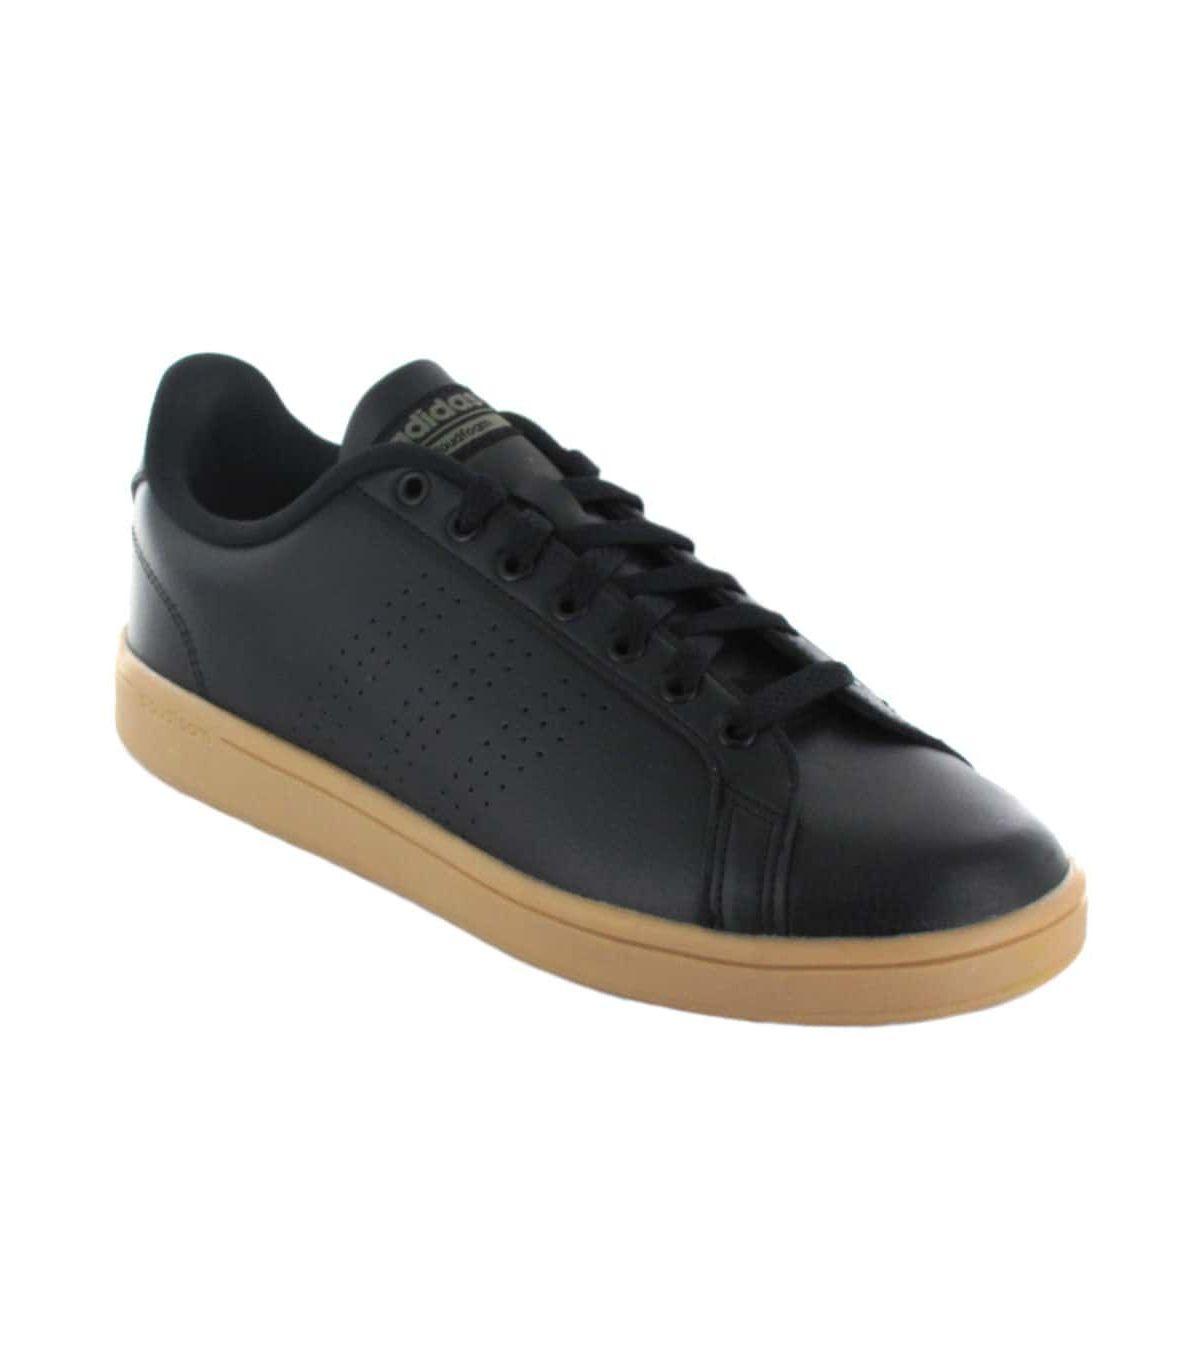 Adidas Advantage CL Negro Adidas Calzado Casual Hombre Lifestyle Tallas: 44, 44 2/3, 45 1/3, 46, 46 2/3, 43 1/3; Color: